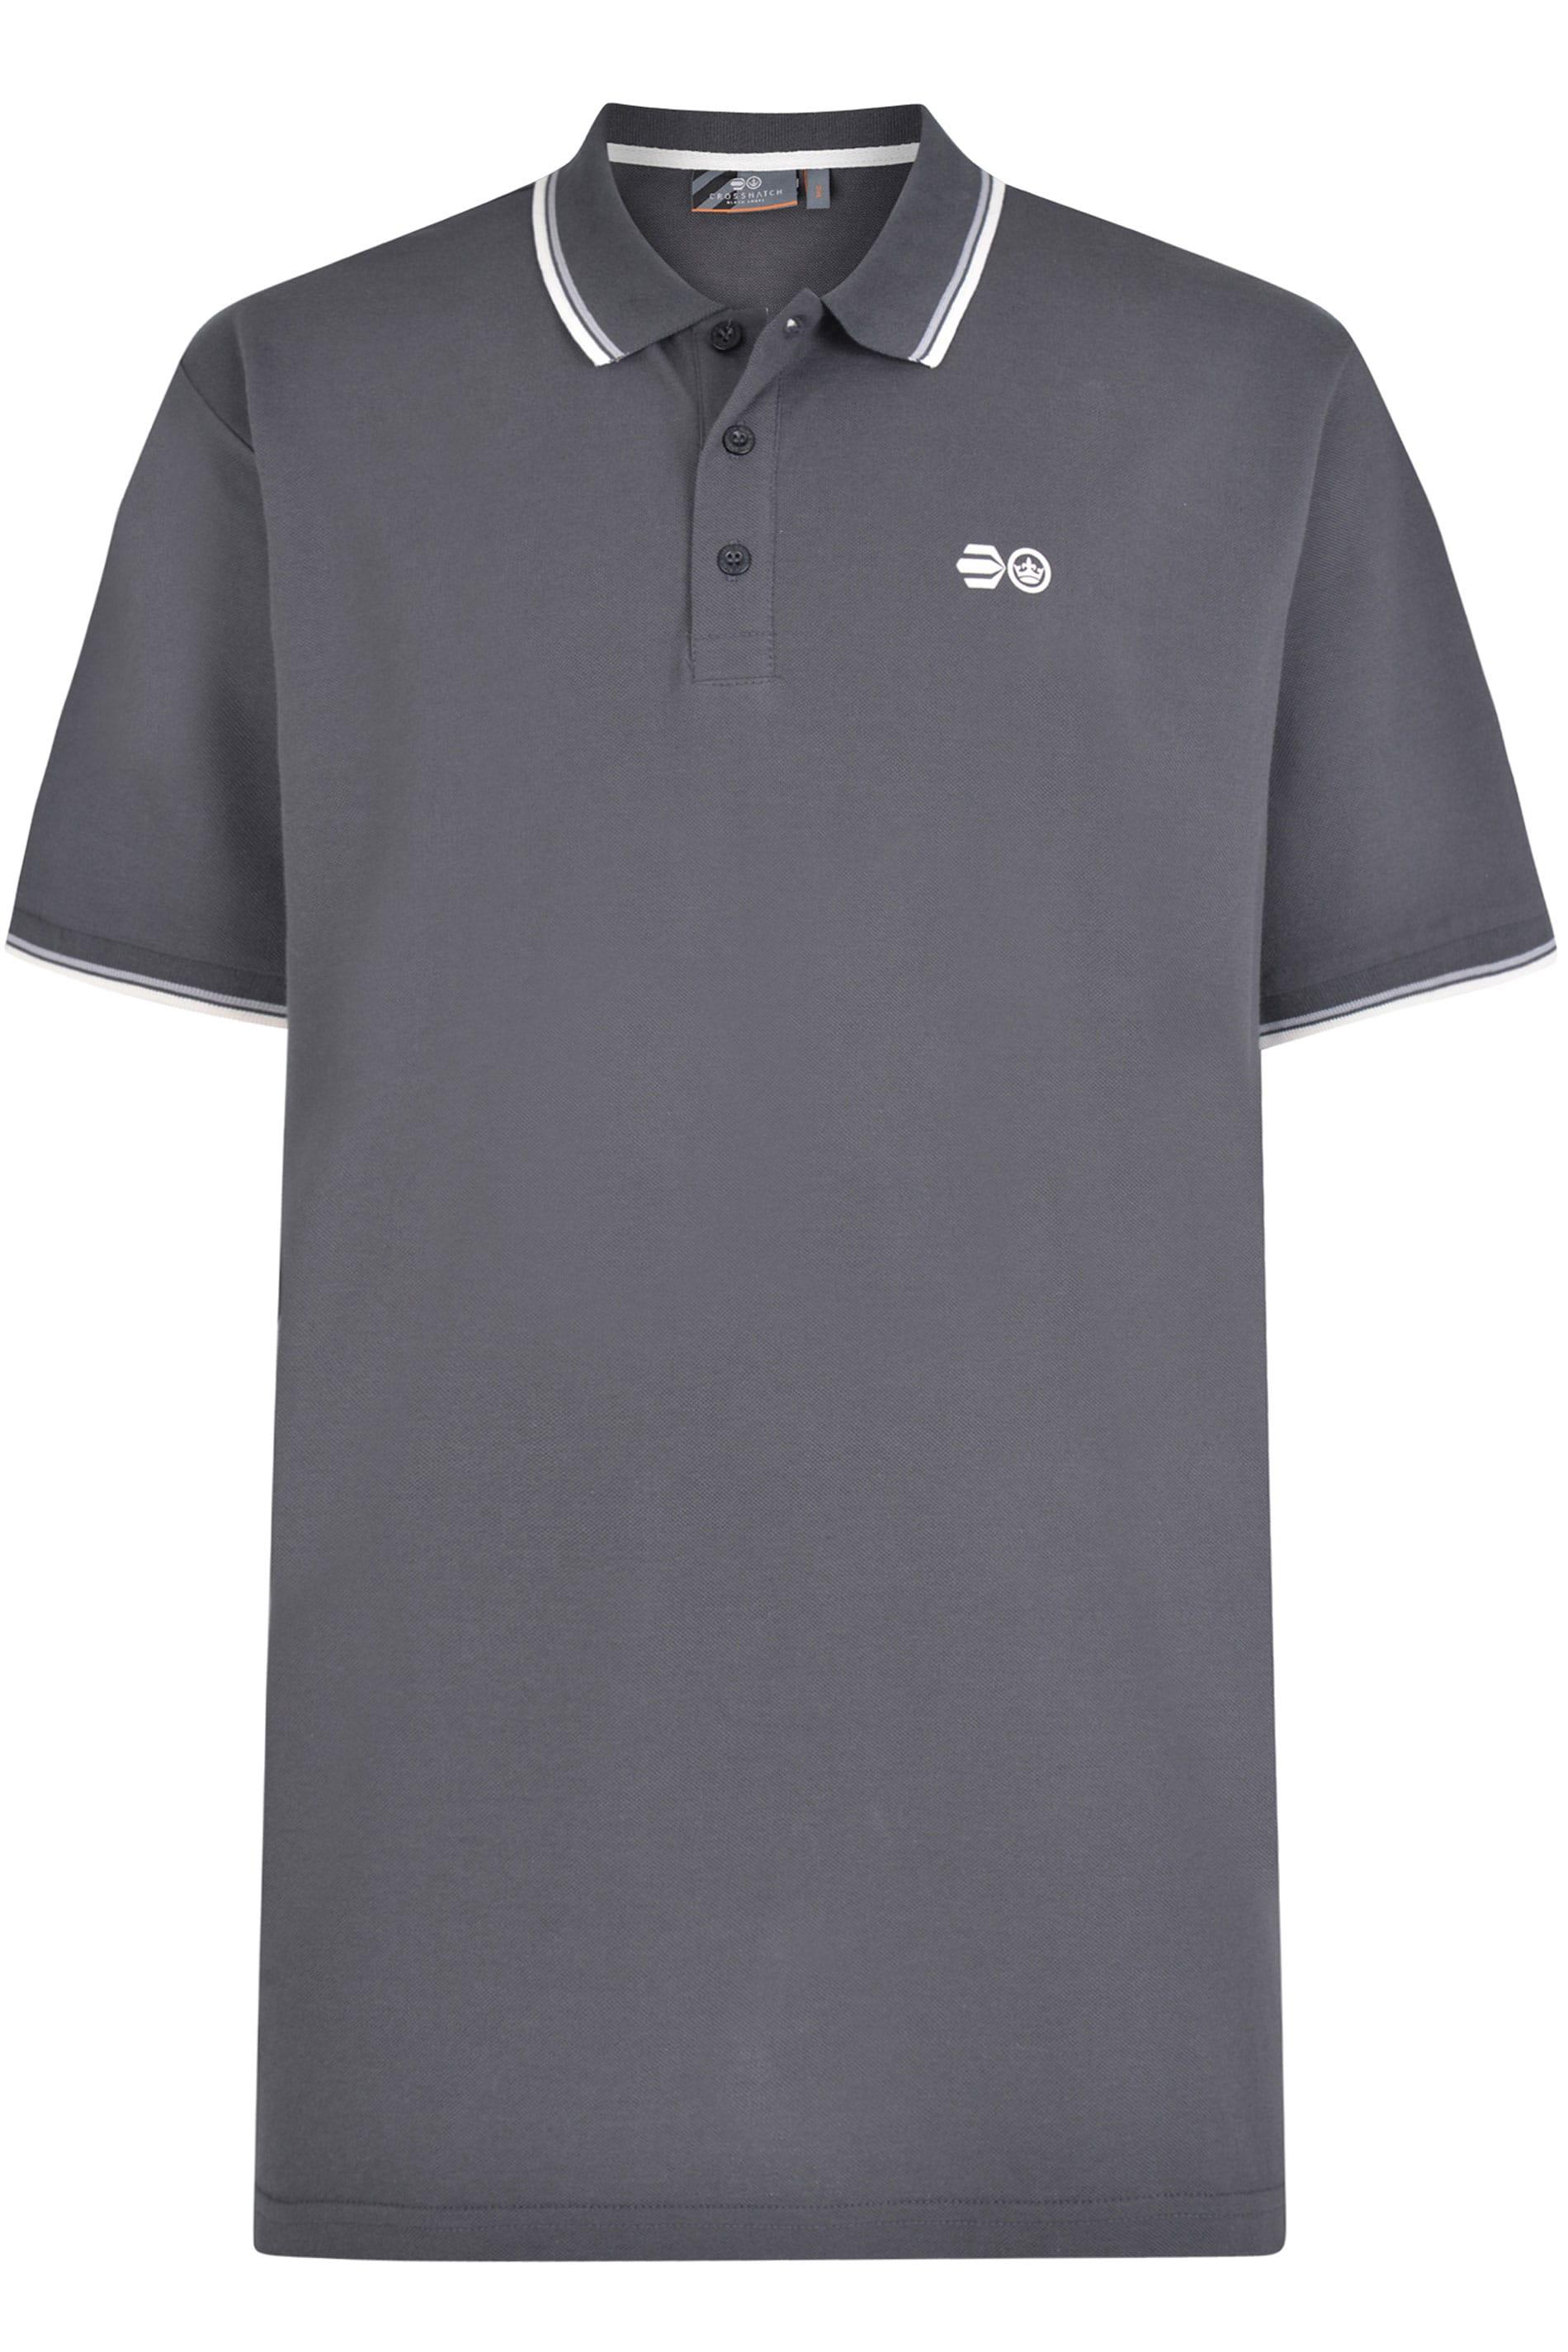 Crosshatch Grey Tipped Polo Shirt